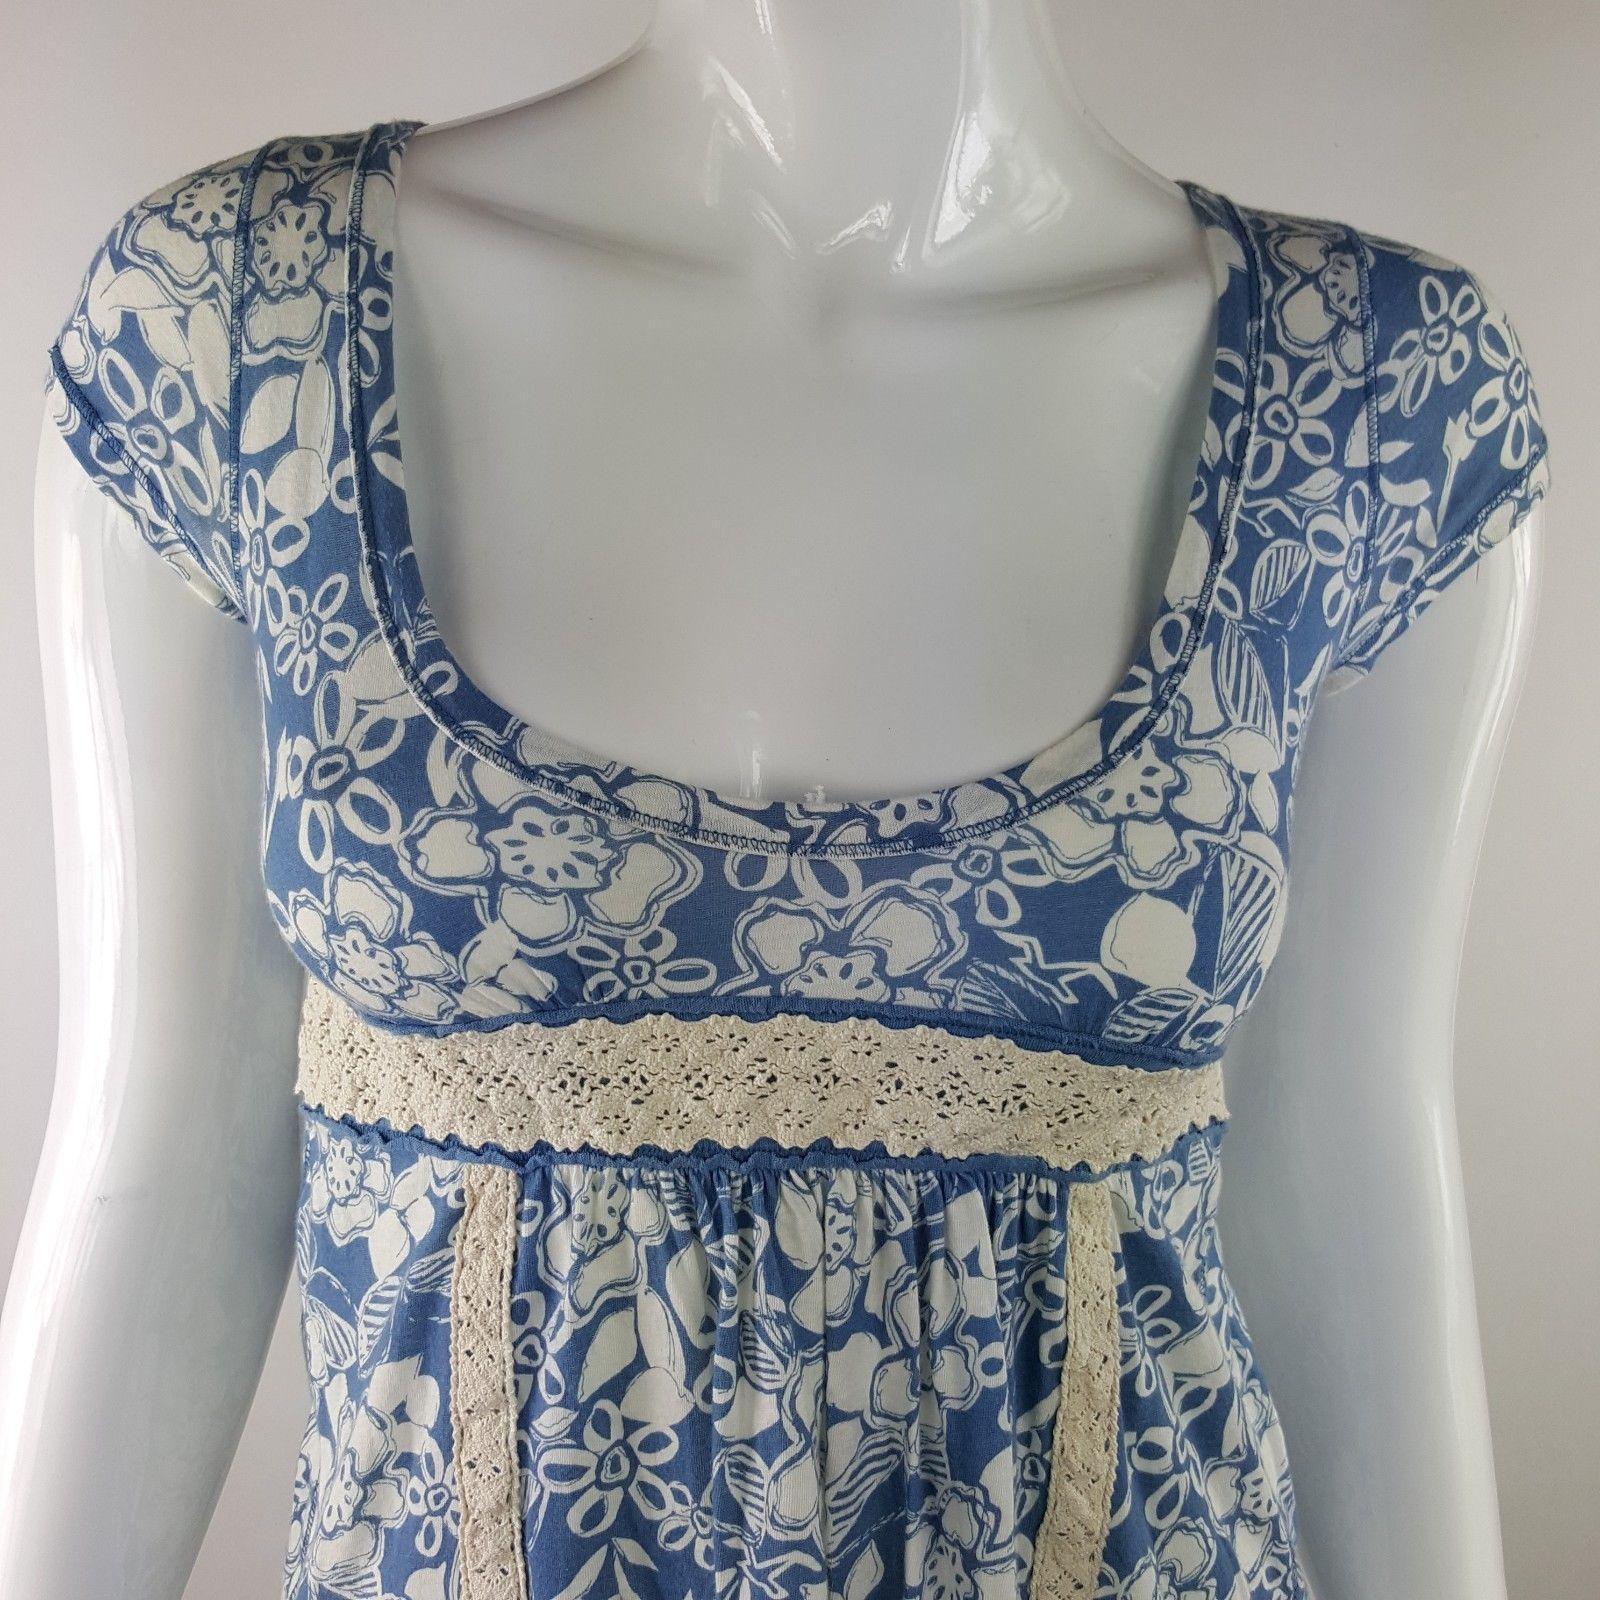 Hollister Womens Junior Small Blue White Floral Peasant Top Empire Waist NWT